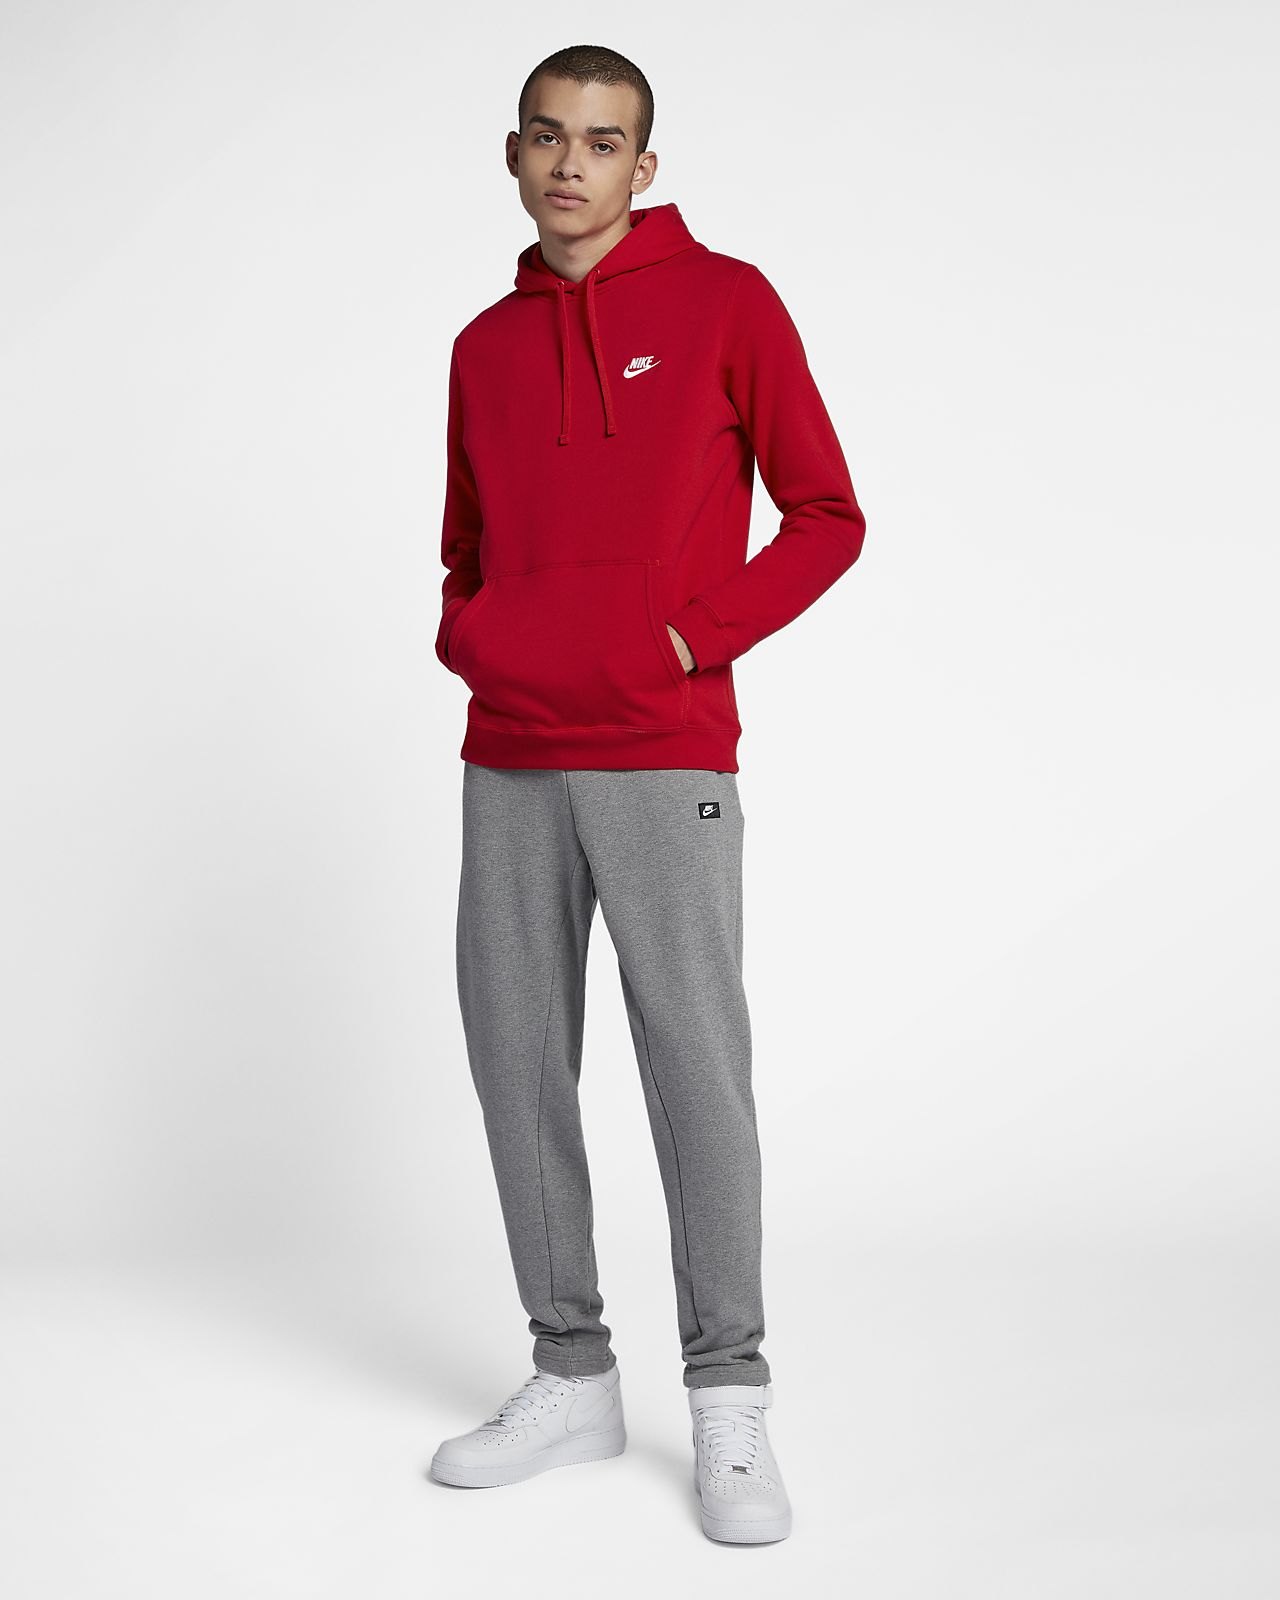 b4bfab82deec Nike Sportswear Club Fleece Pullover Hoodie. Nike.com